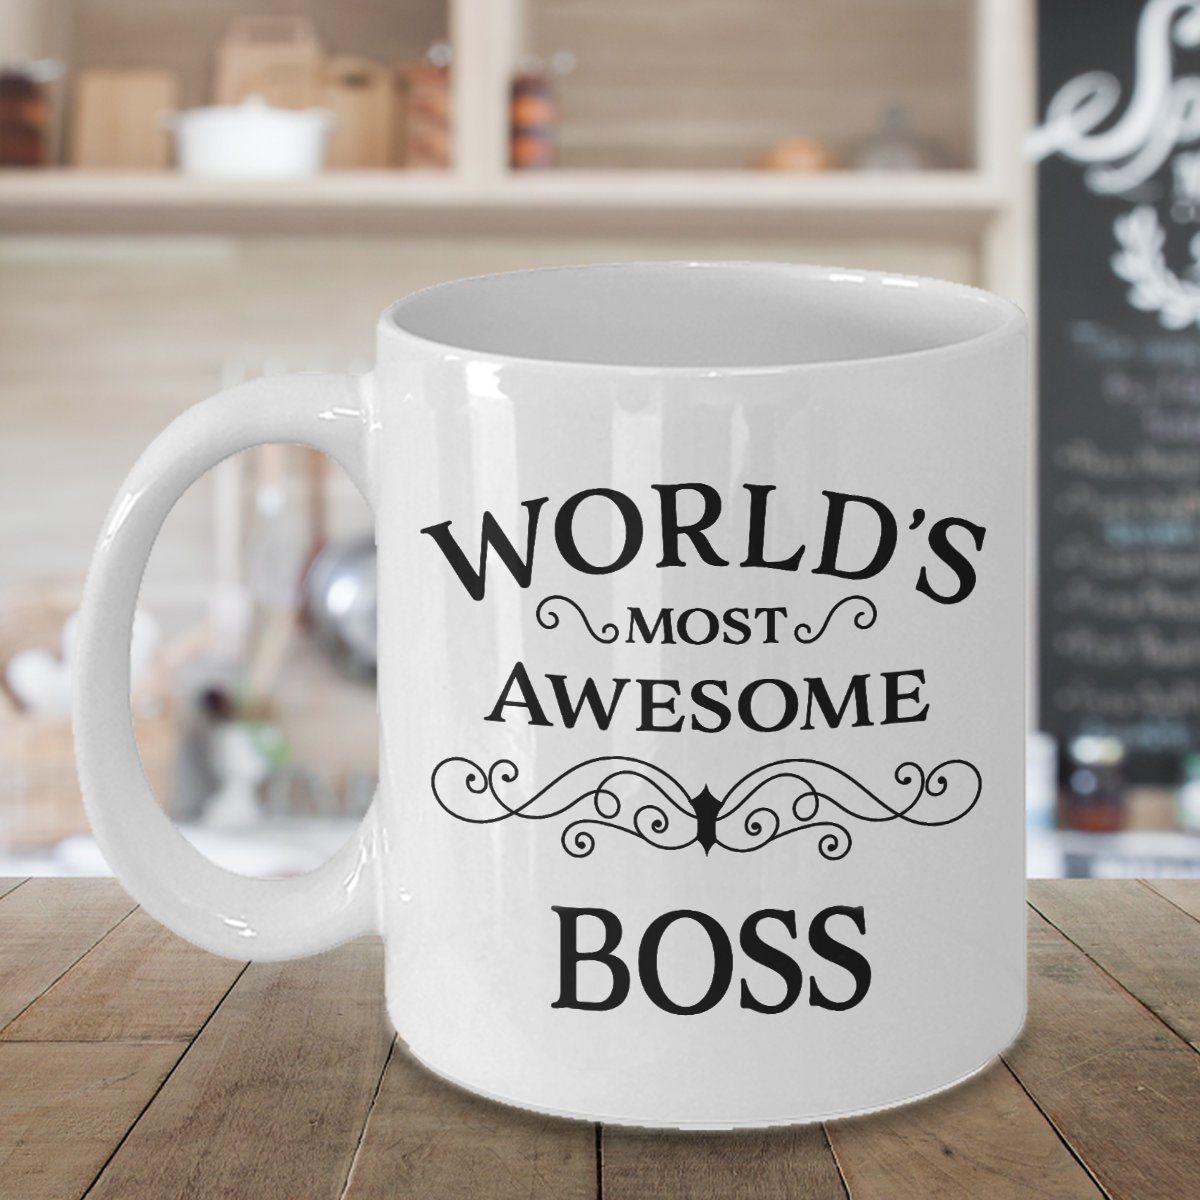 Boss thank you gift ideas for best friend coworker boss